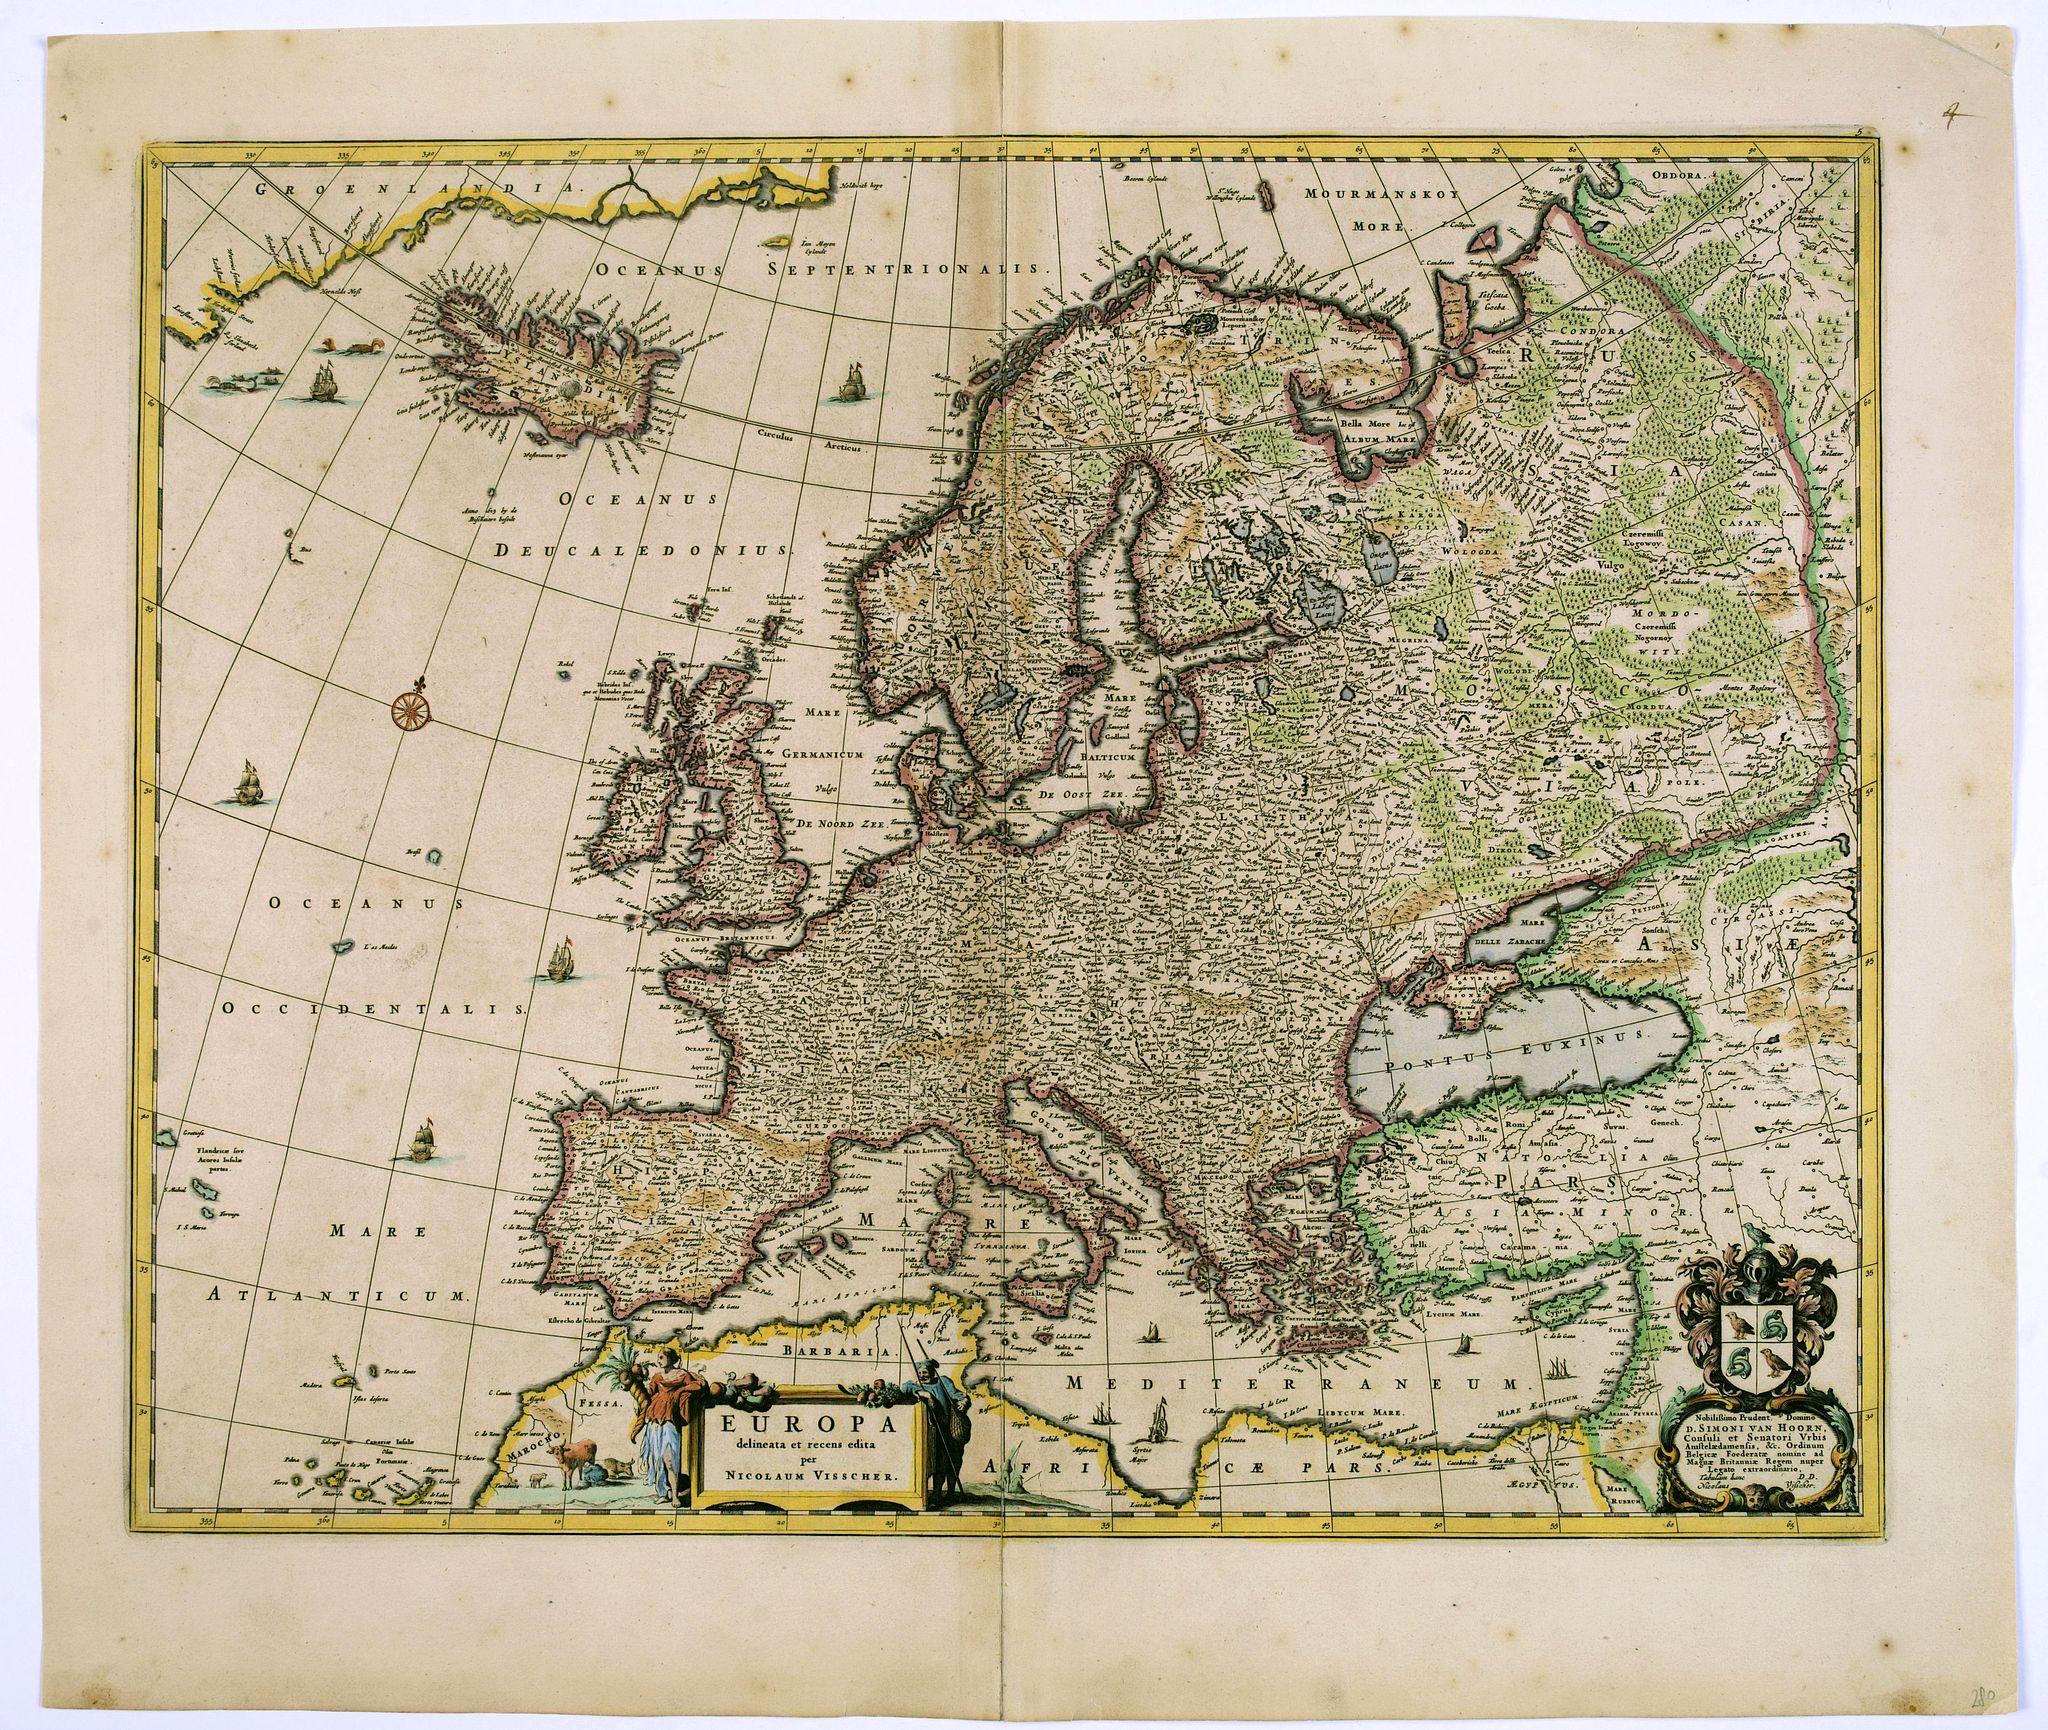 VISSCHER, N. - Europa Delineata et Recens Edita.